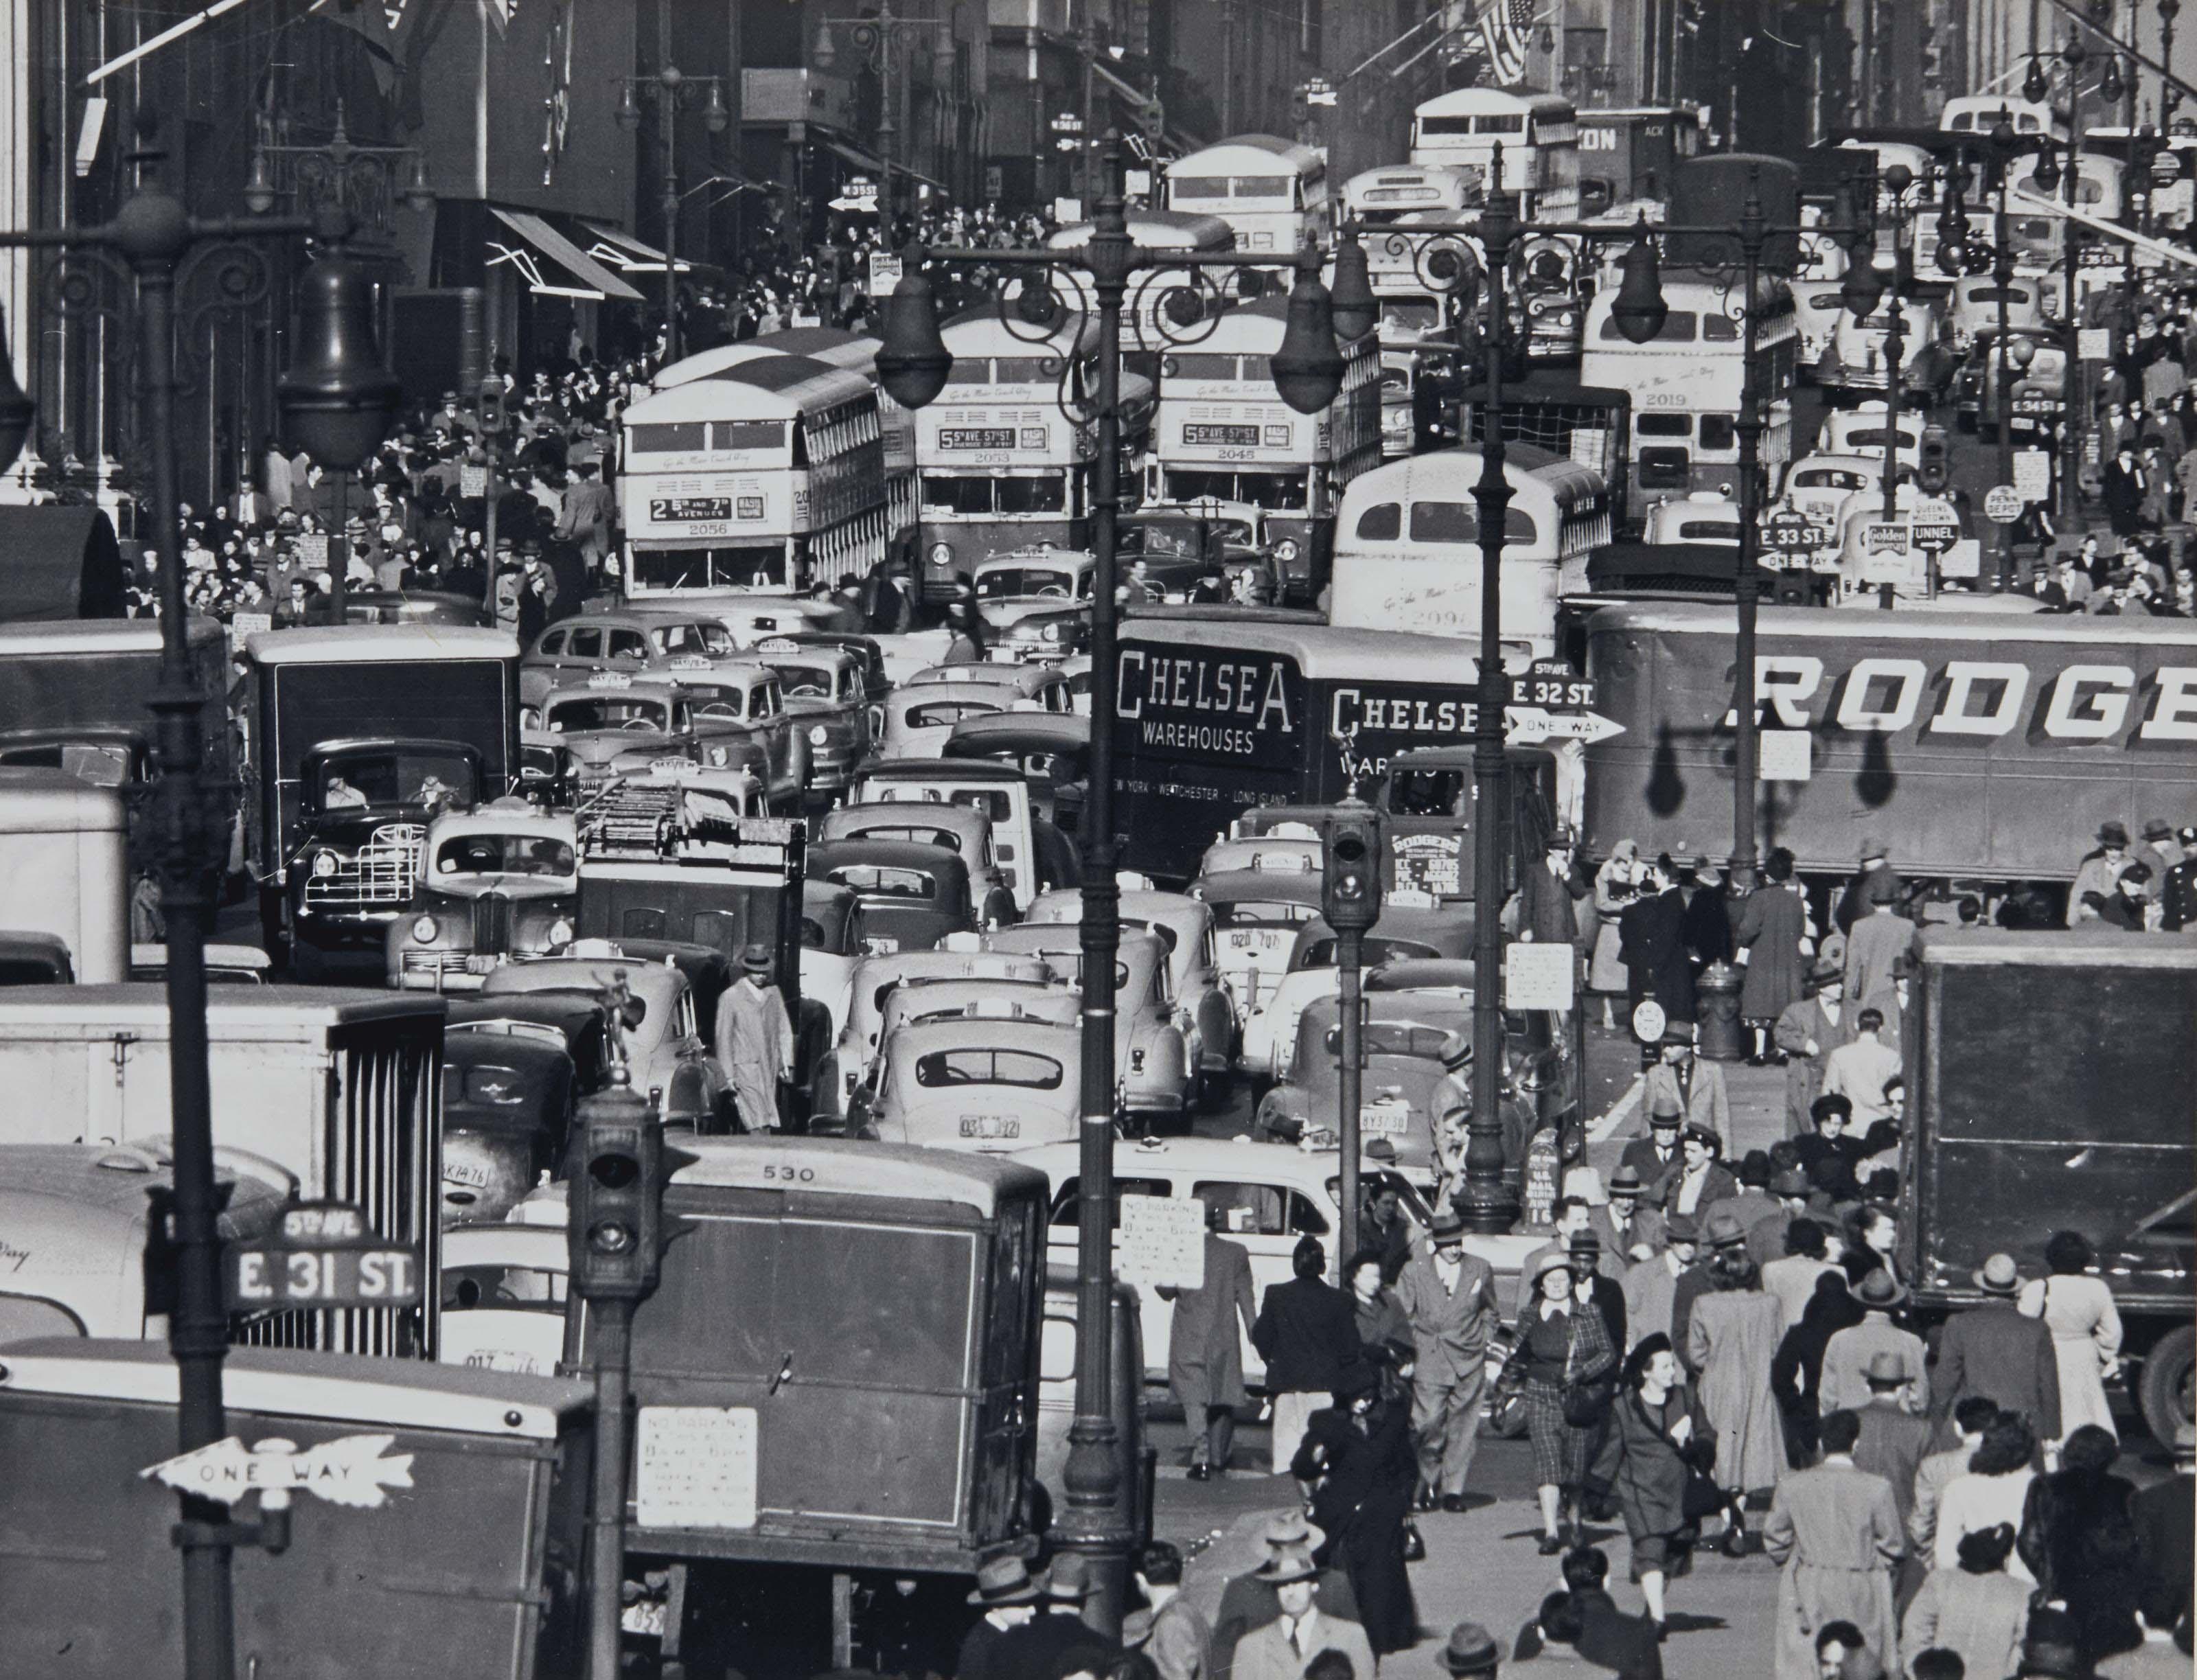 Traffic on Fifth Avenue, New York, 1950